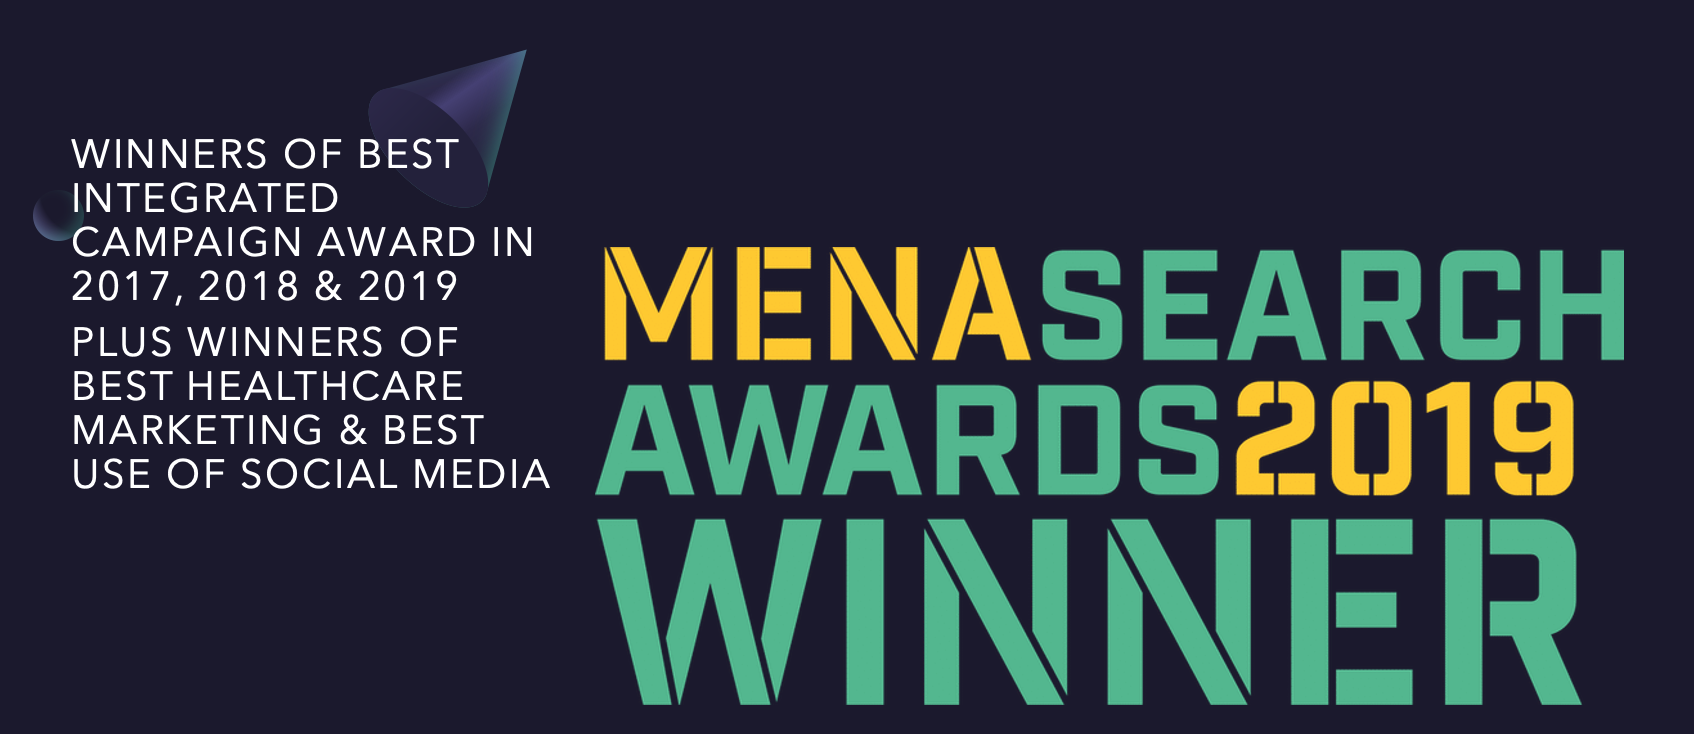 MENA Search Awards